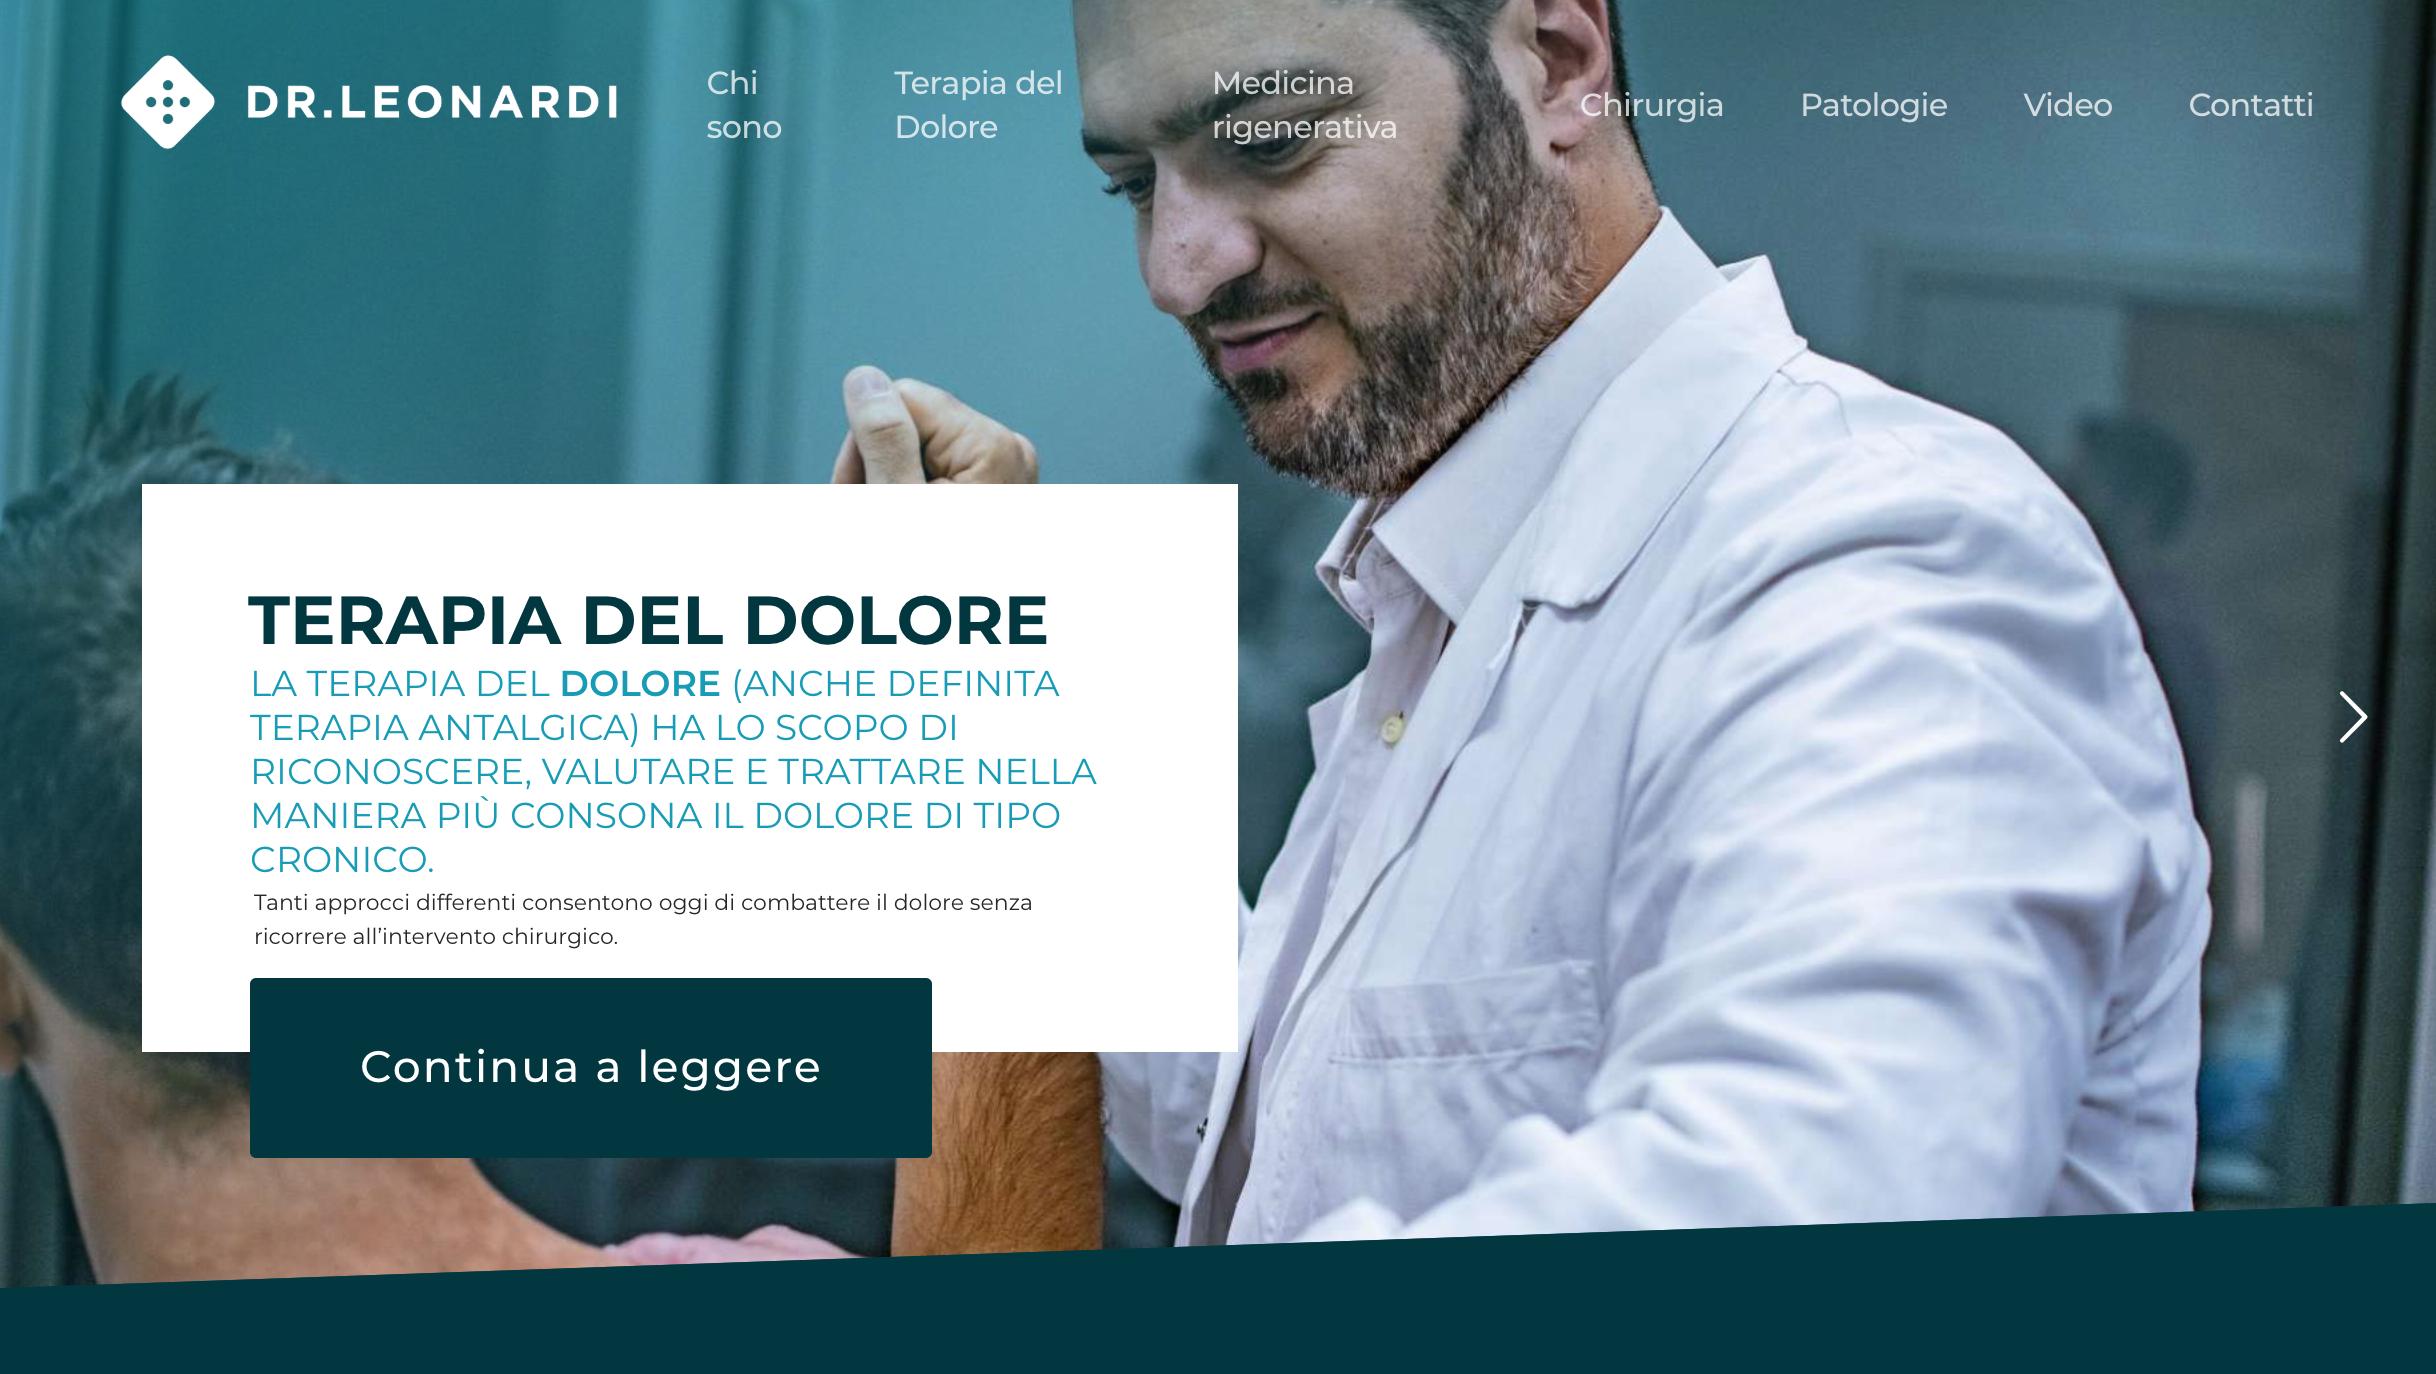 Dr Leonardi